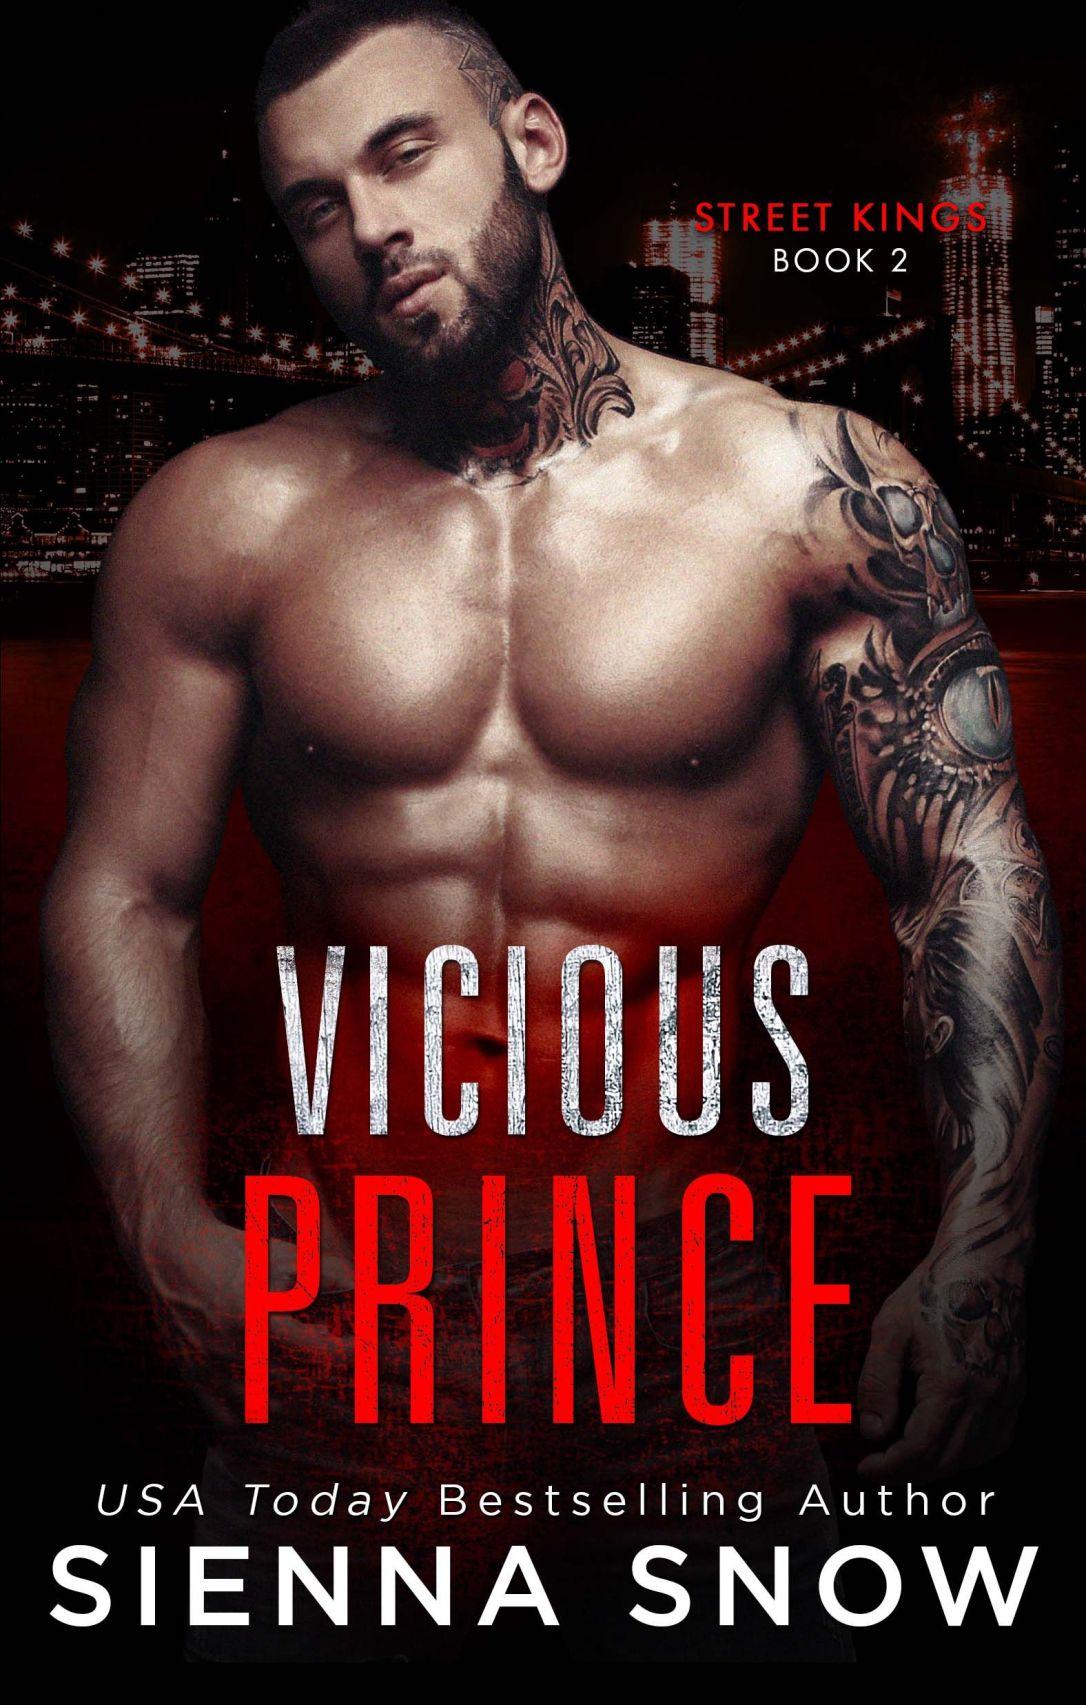 Vicious Prince by Sienna Snow